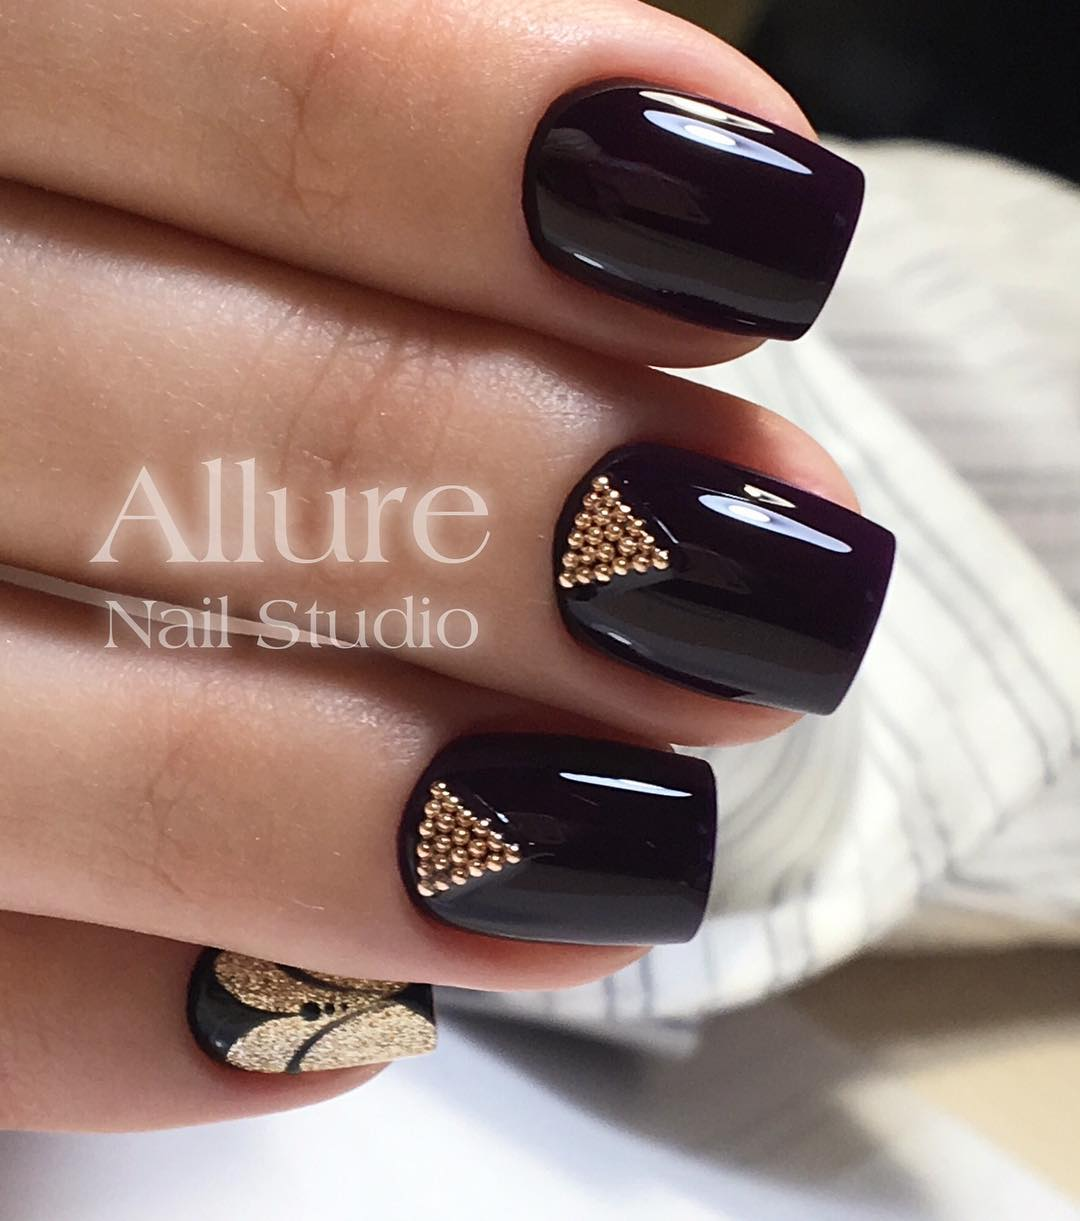 allure_nail_studio-5.jpg